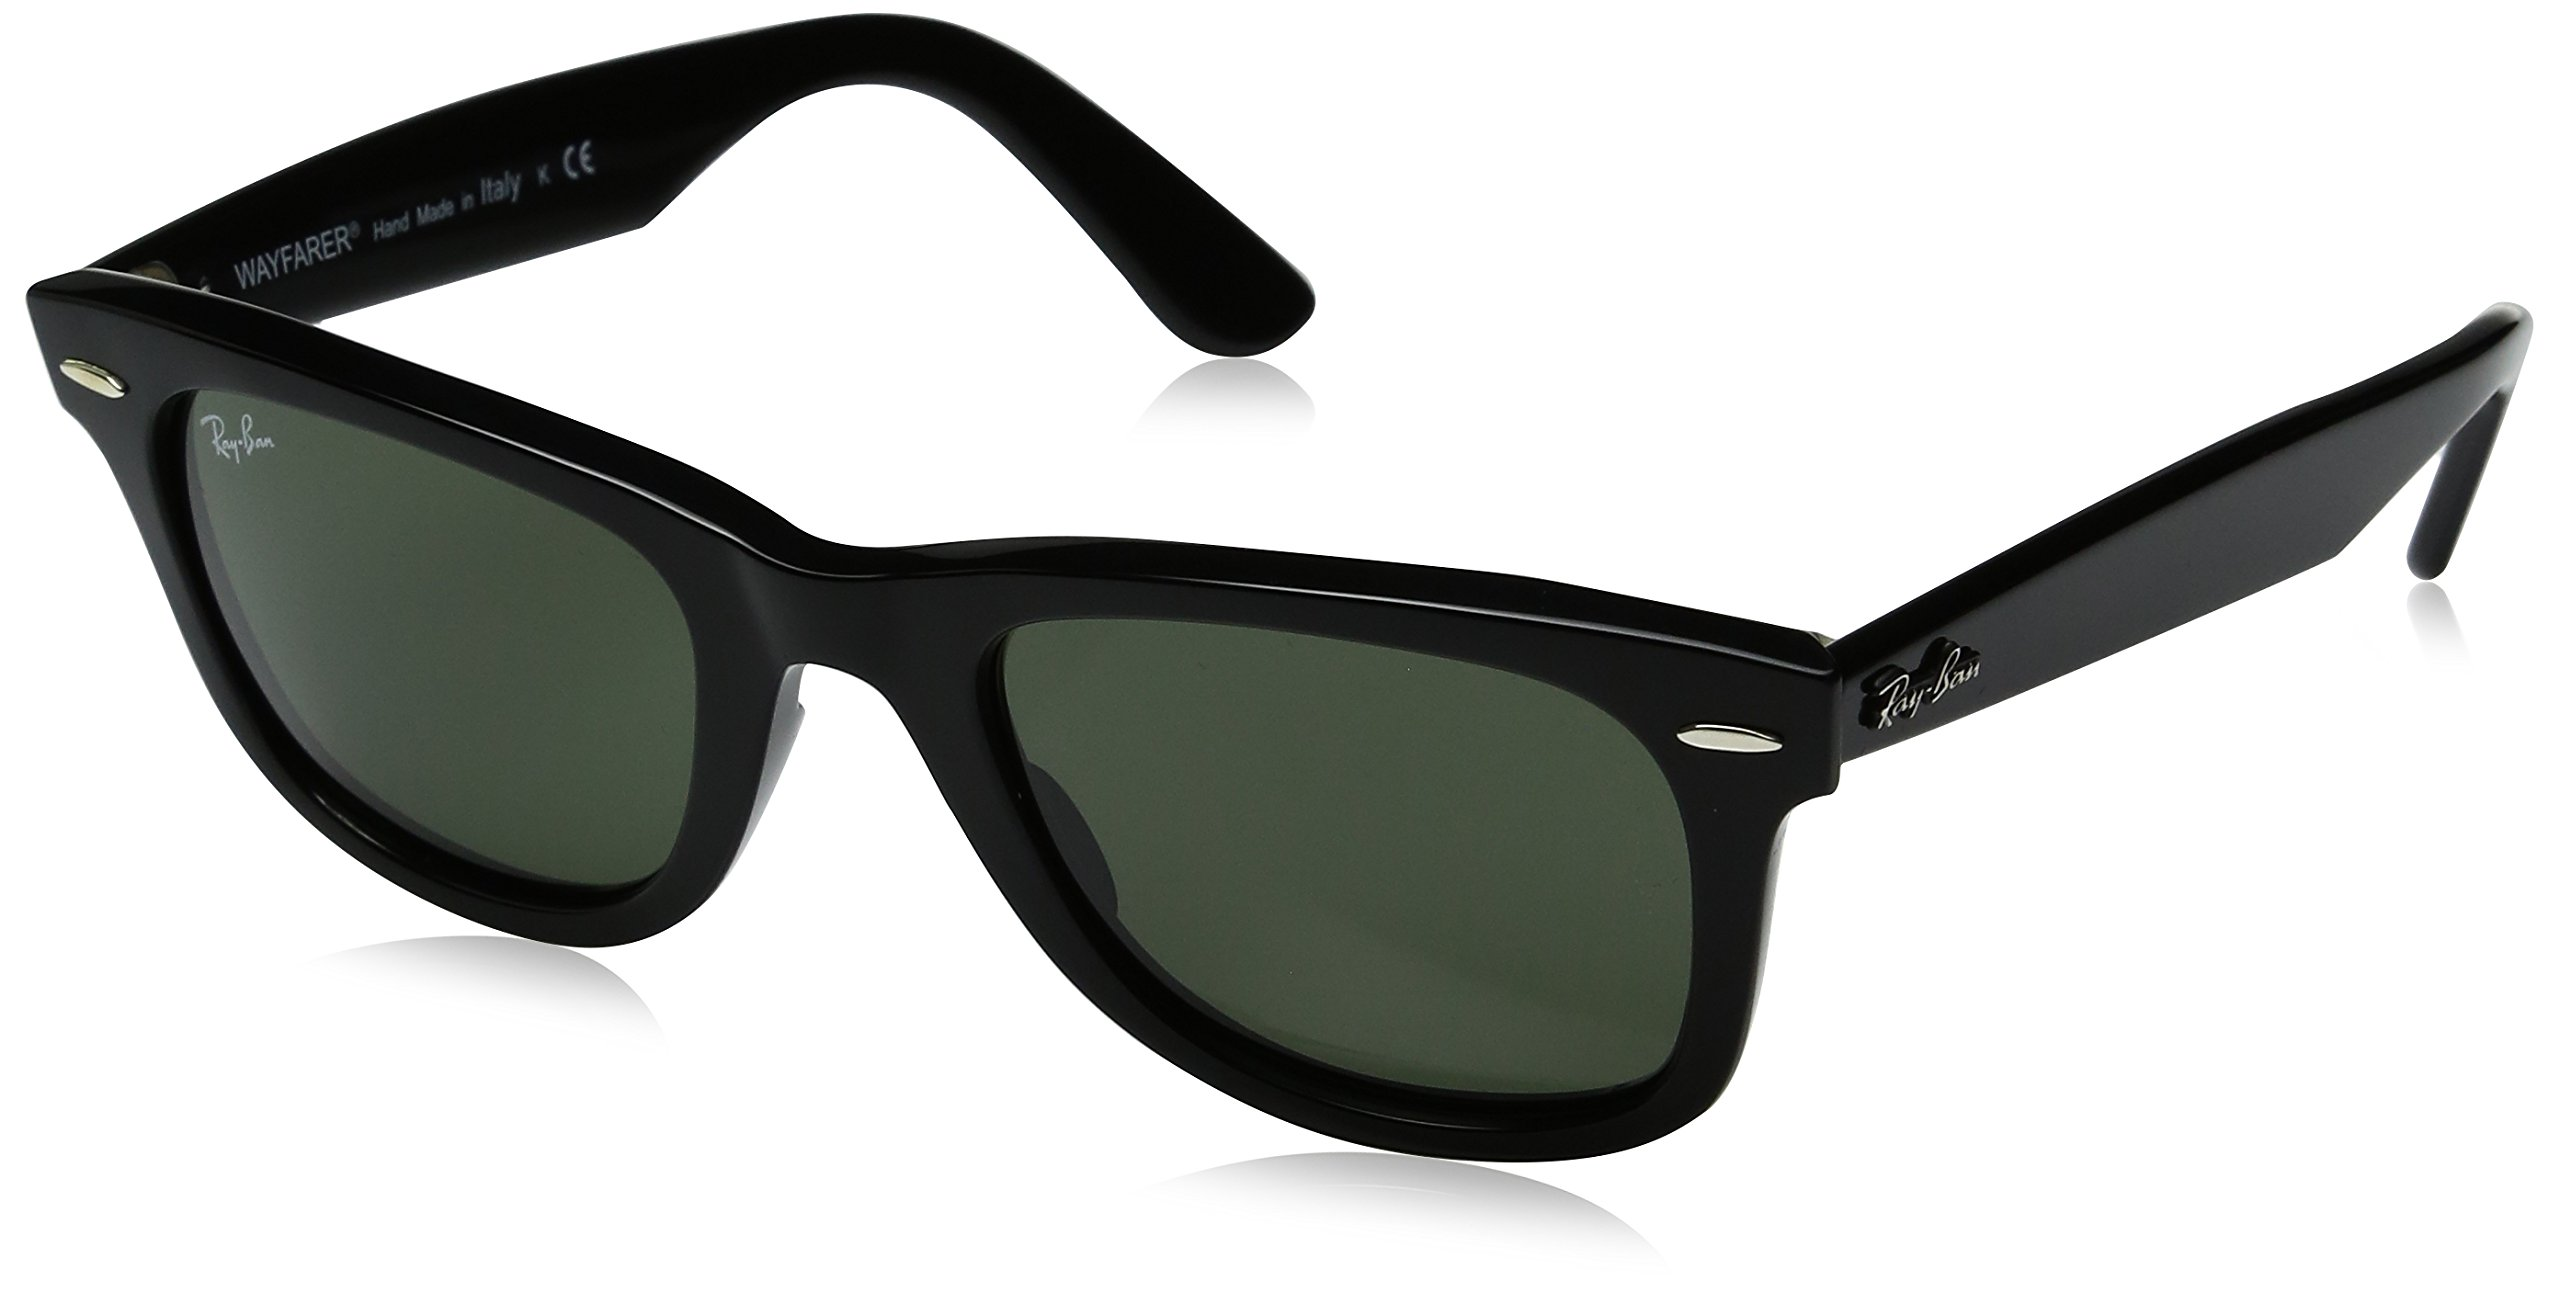 Ray-Ban RB2140 Wayfarer Sunglasses, Black/Green, 50 mm by RAY-BAN